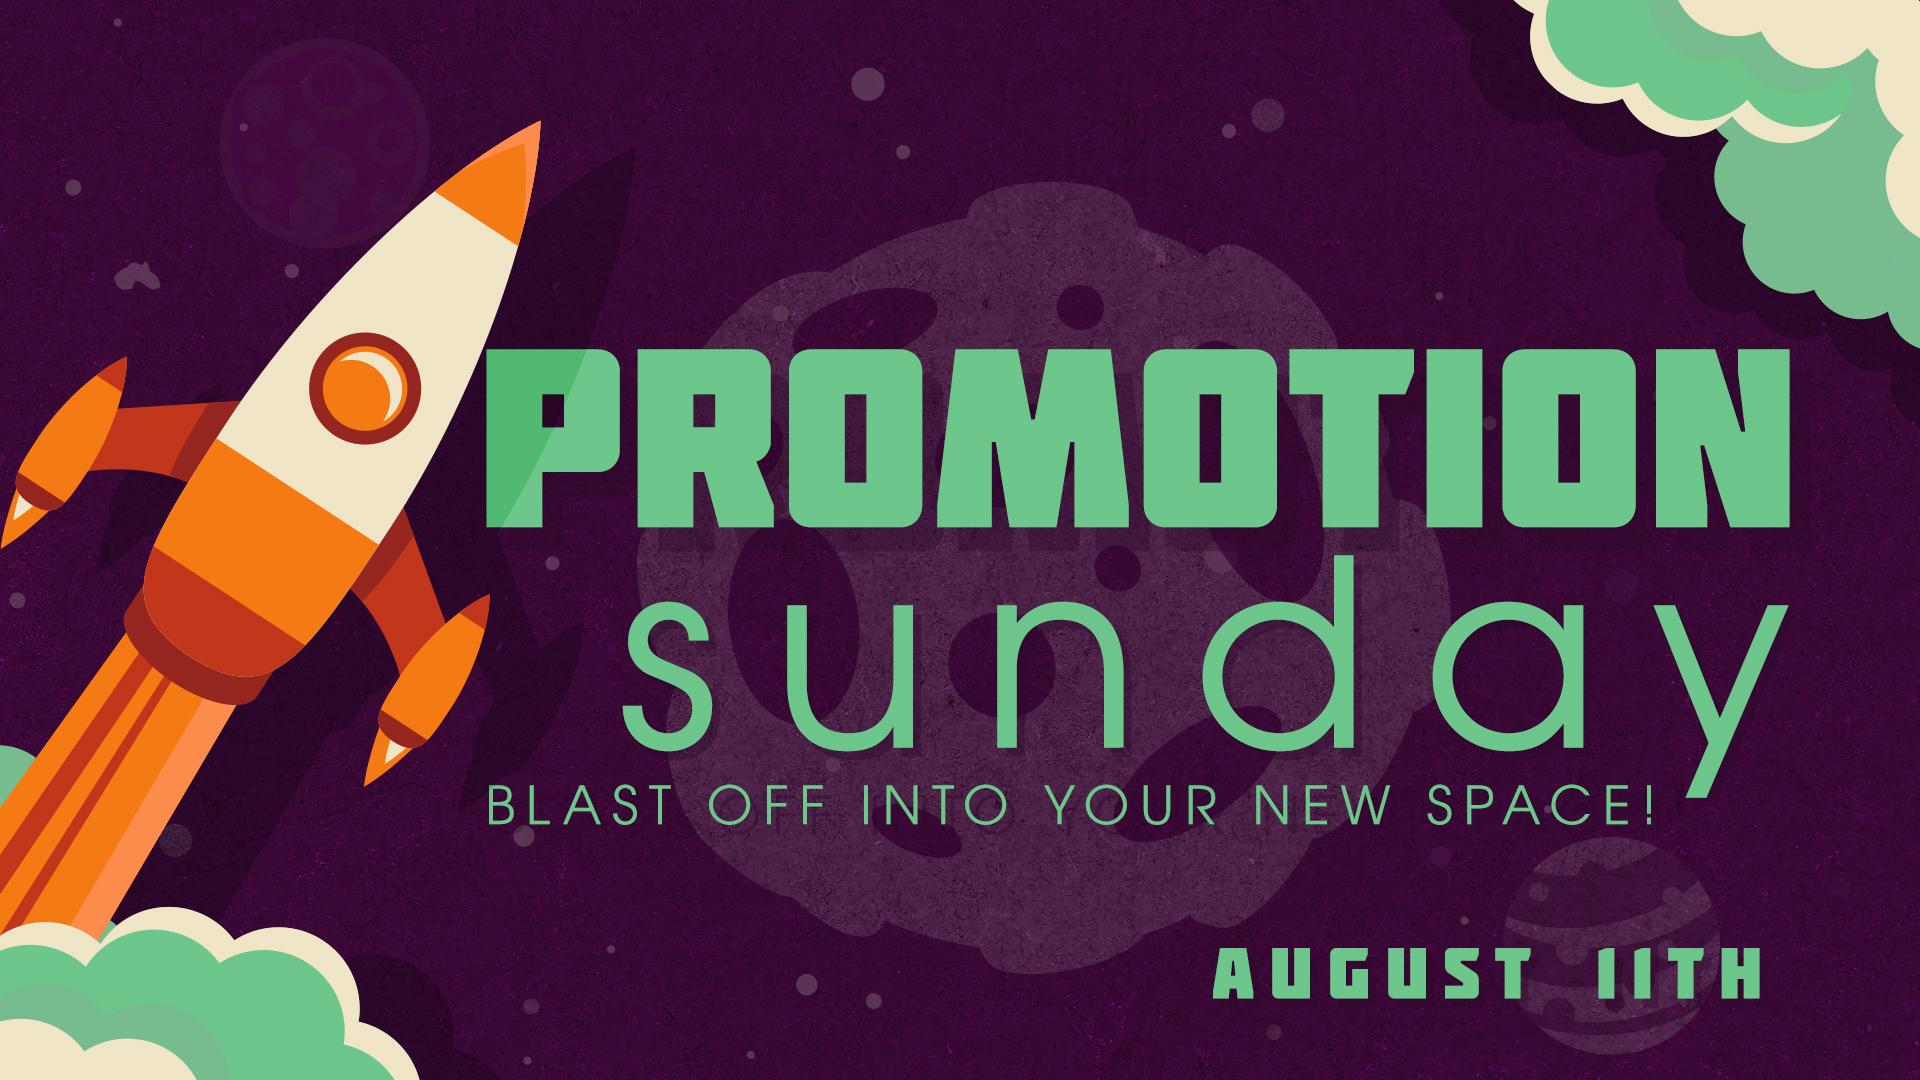 Promotion-Sunday.jpg